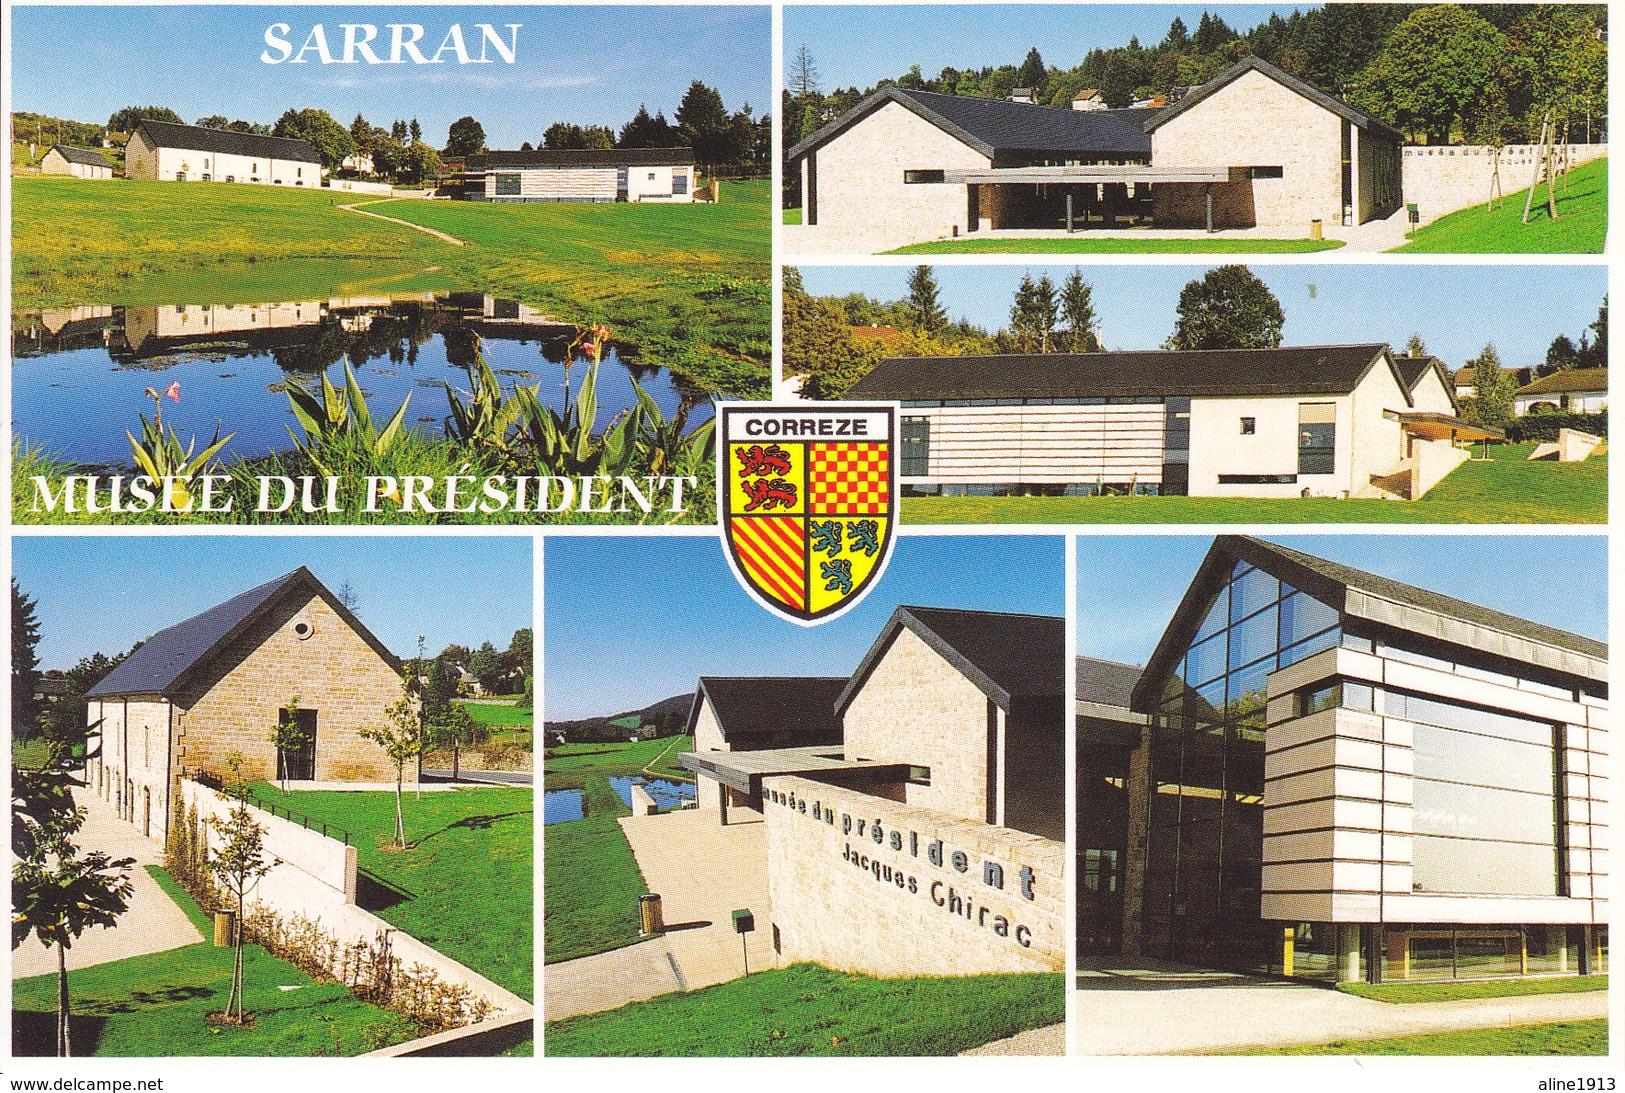 19  SARRAN - MULTIVUES / MUSEE DU PRESDIDENT JACQUES CHIRAC / - Francia